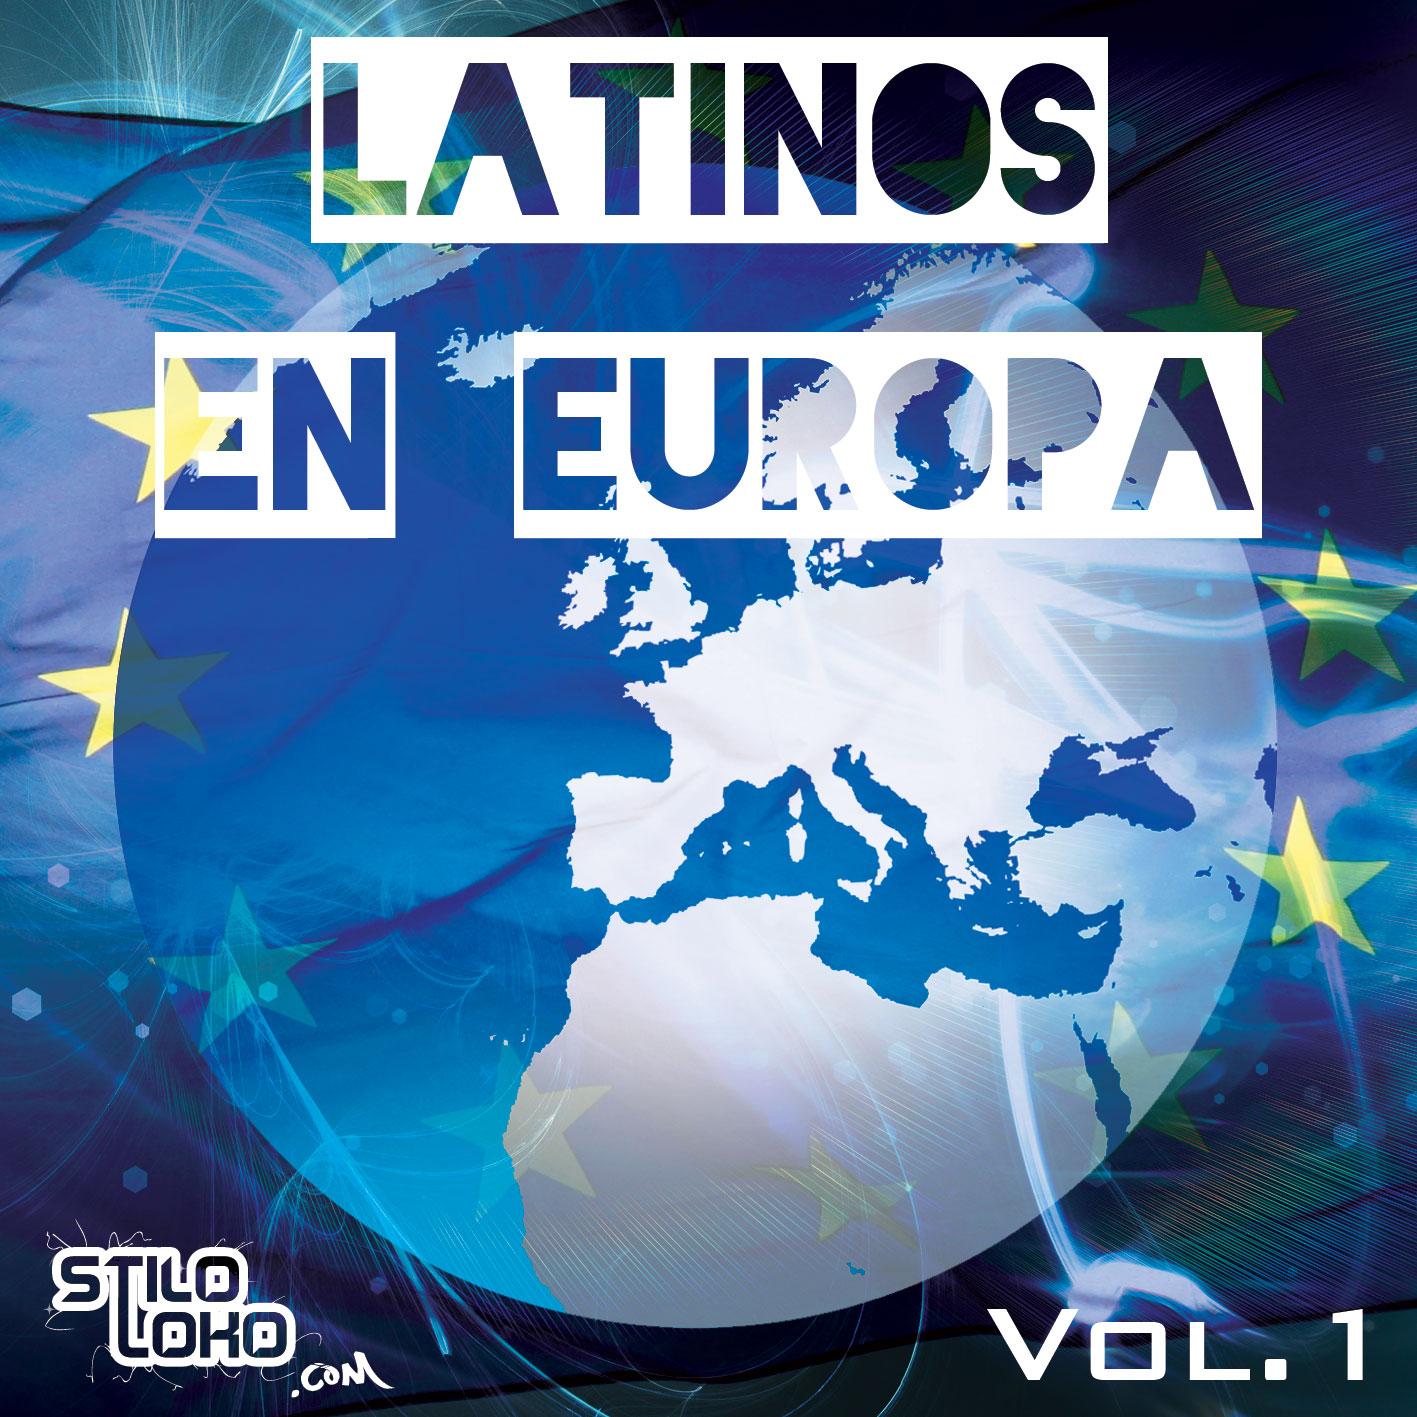 latinos en europa mixtape vol1